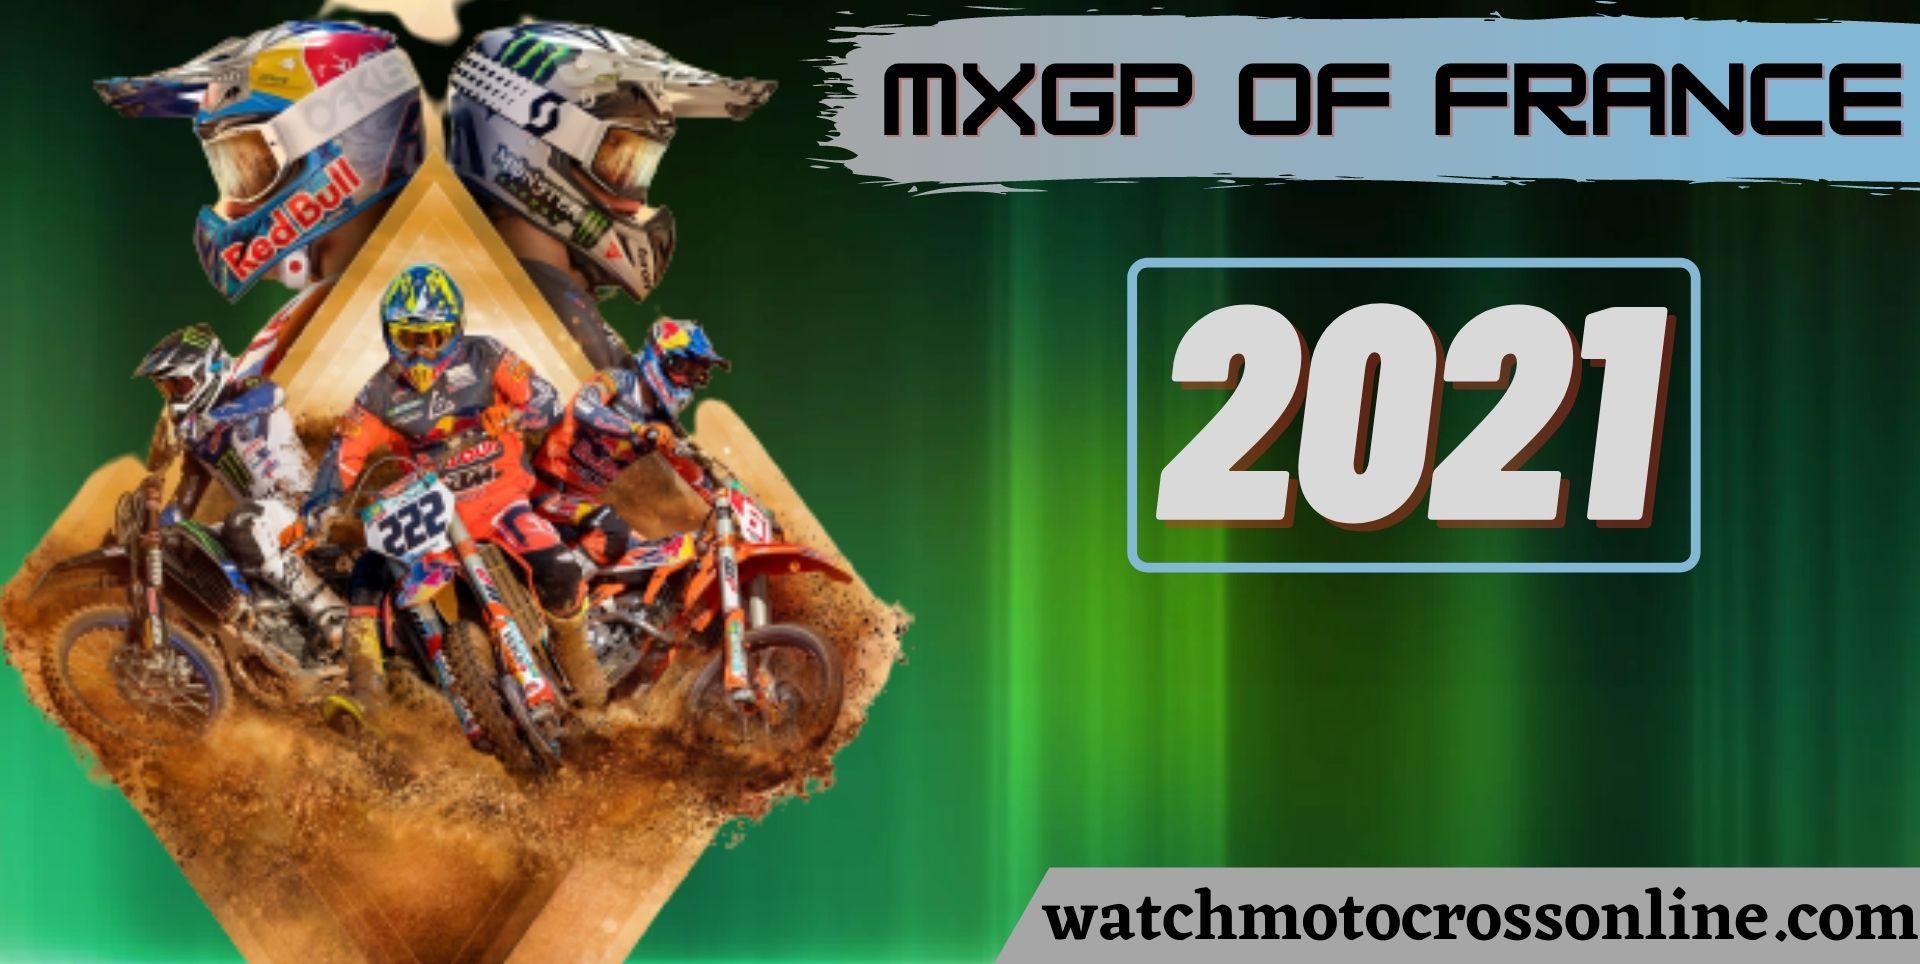 MXGP Of France Live Stream 2021